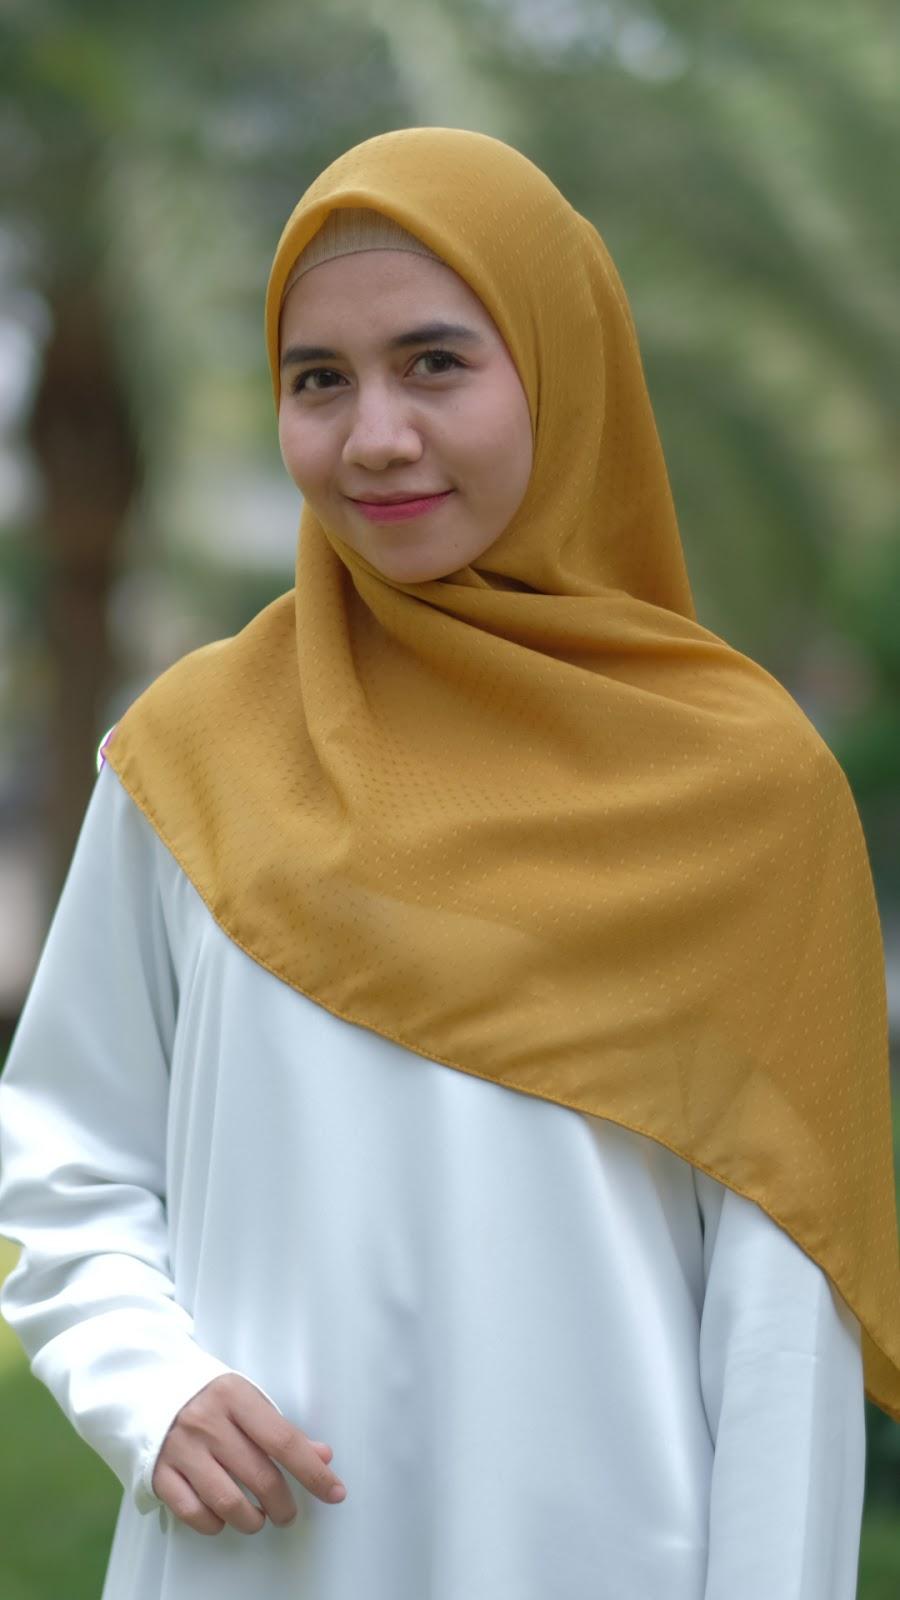 wallpaper muslimah cantik hijab cewek manis Jilbab kuning dan seksi